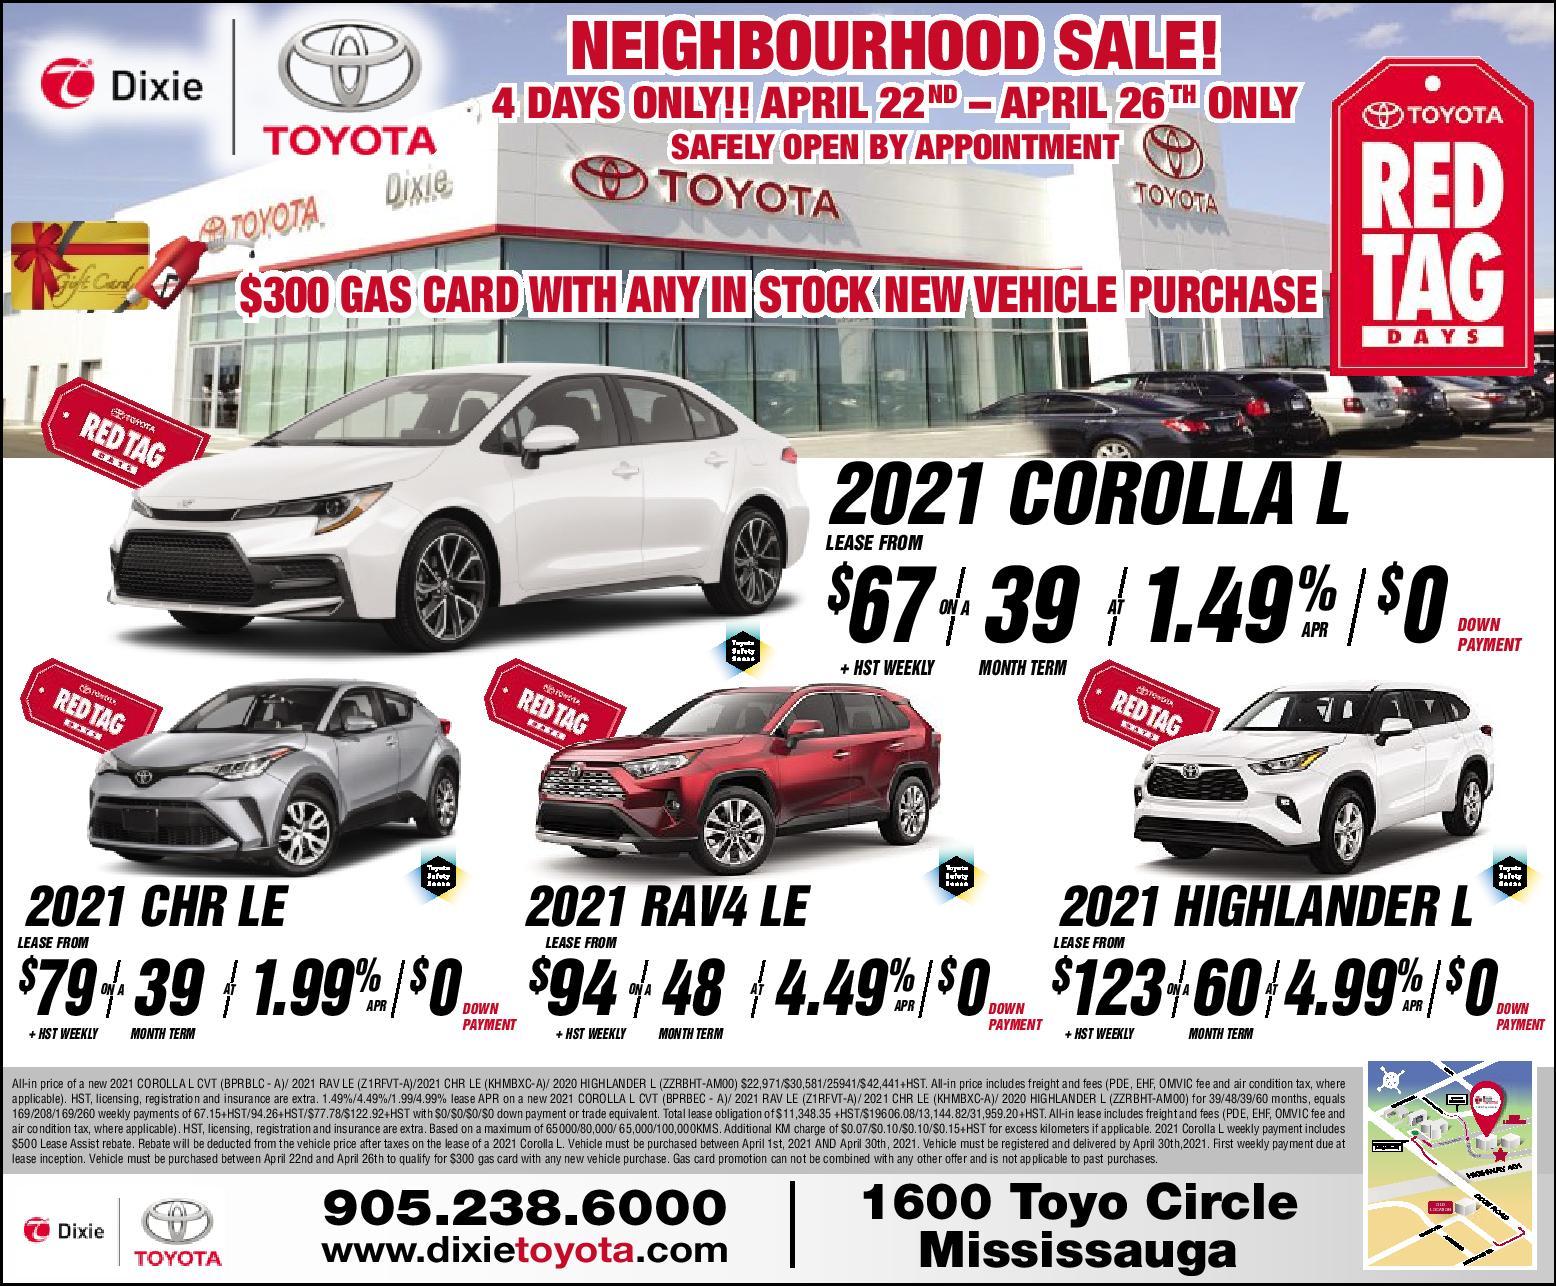 Neighbourhood Sale